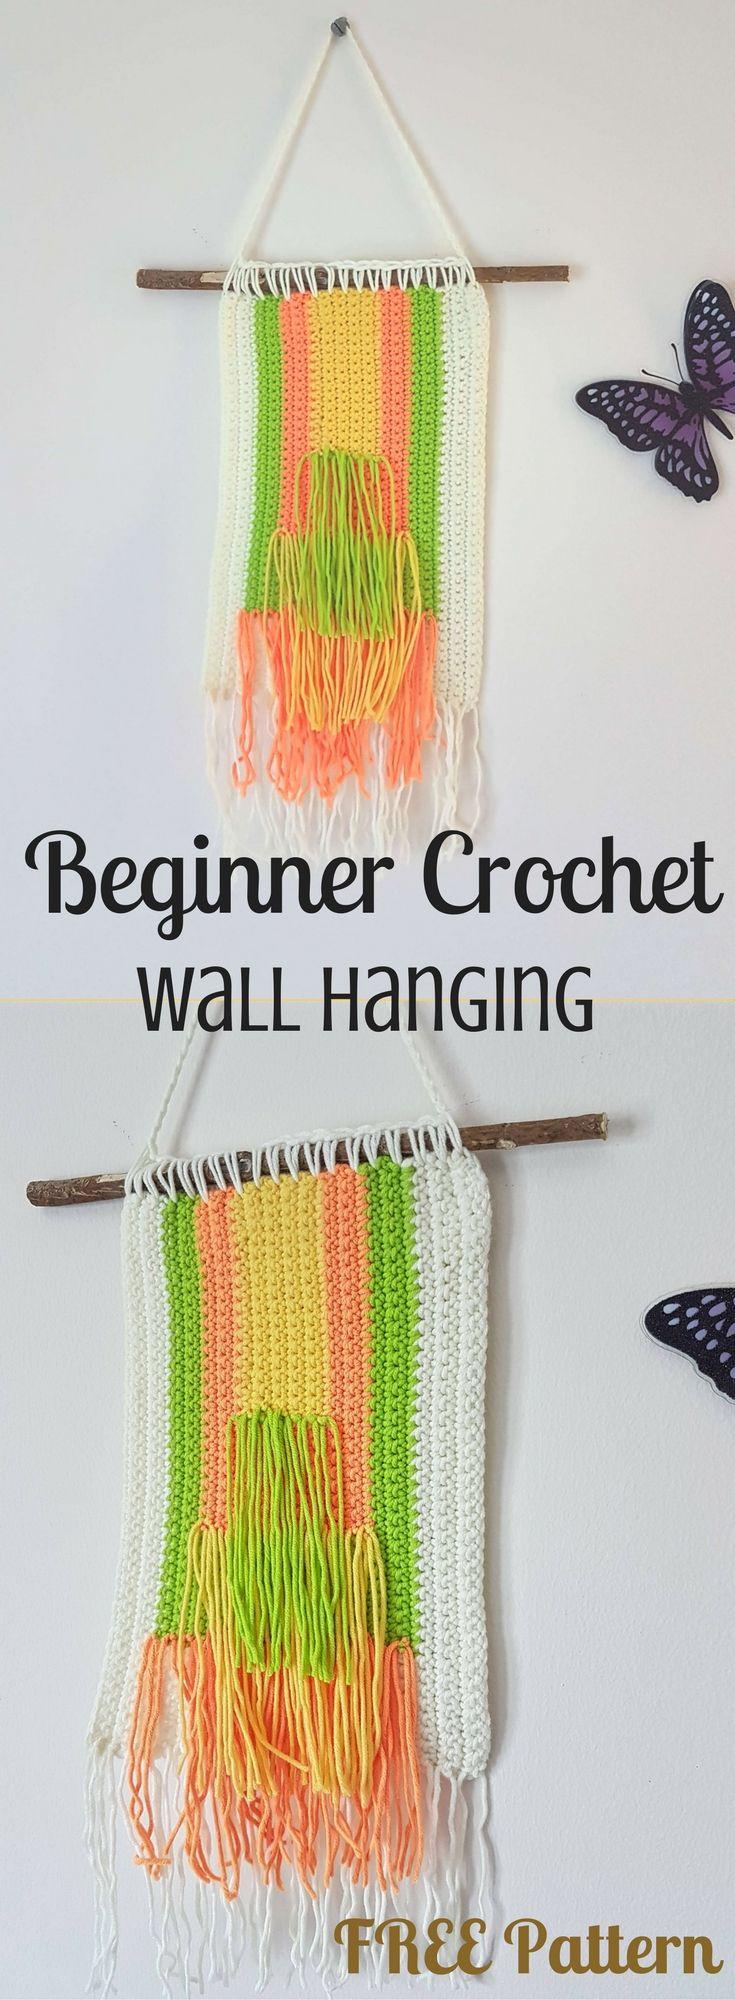 104 Best Crochet Wall Art Images On Pinterest Crochet